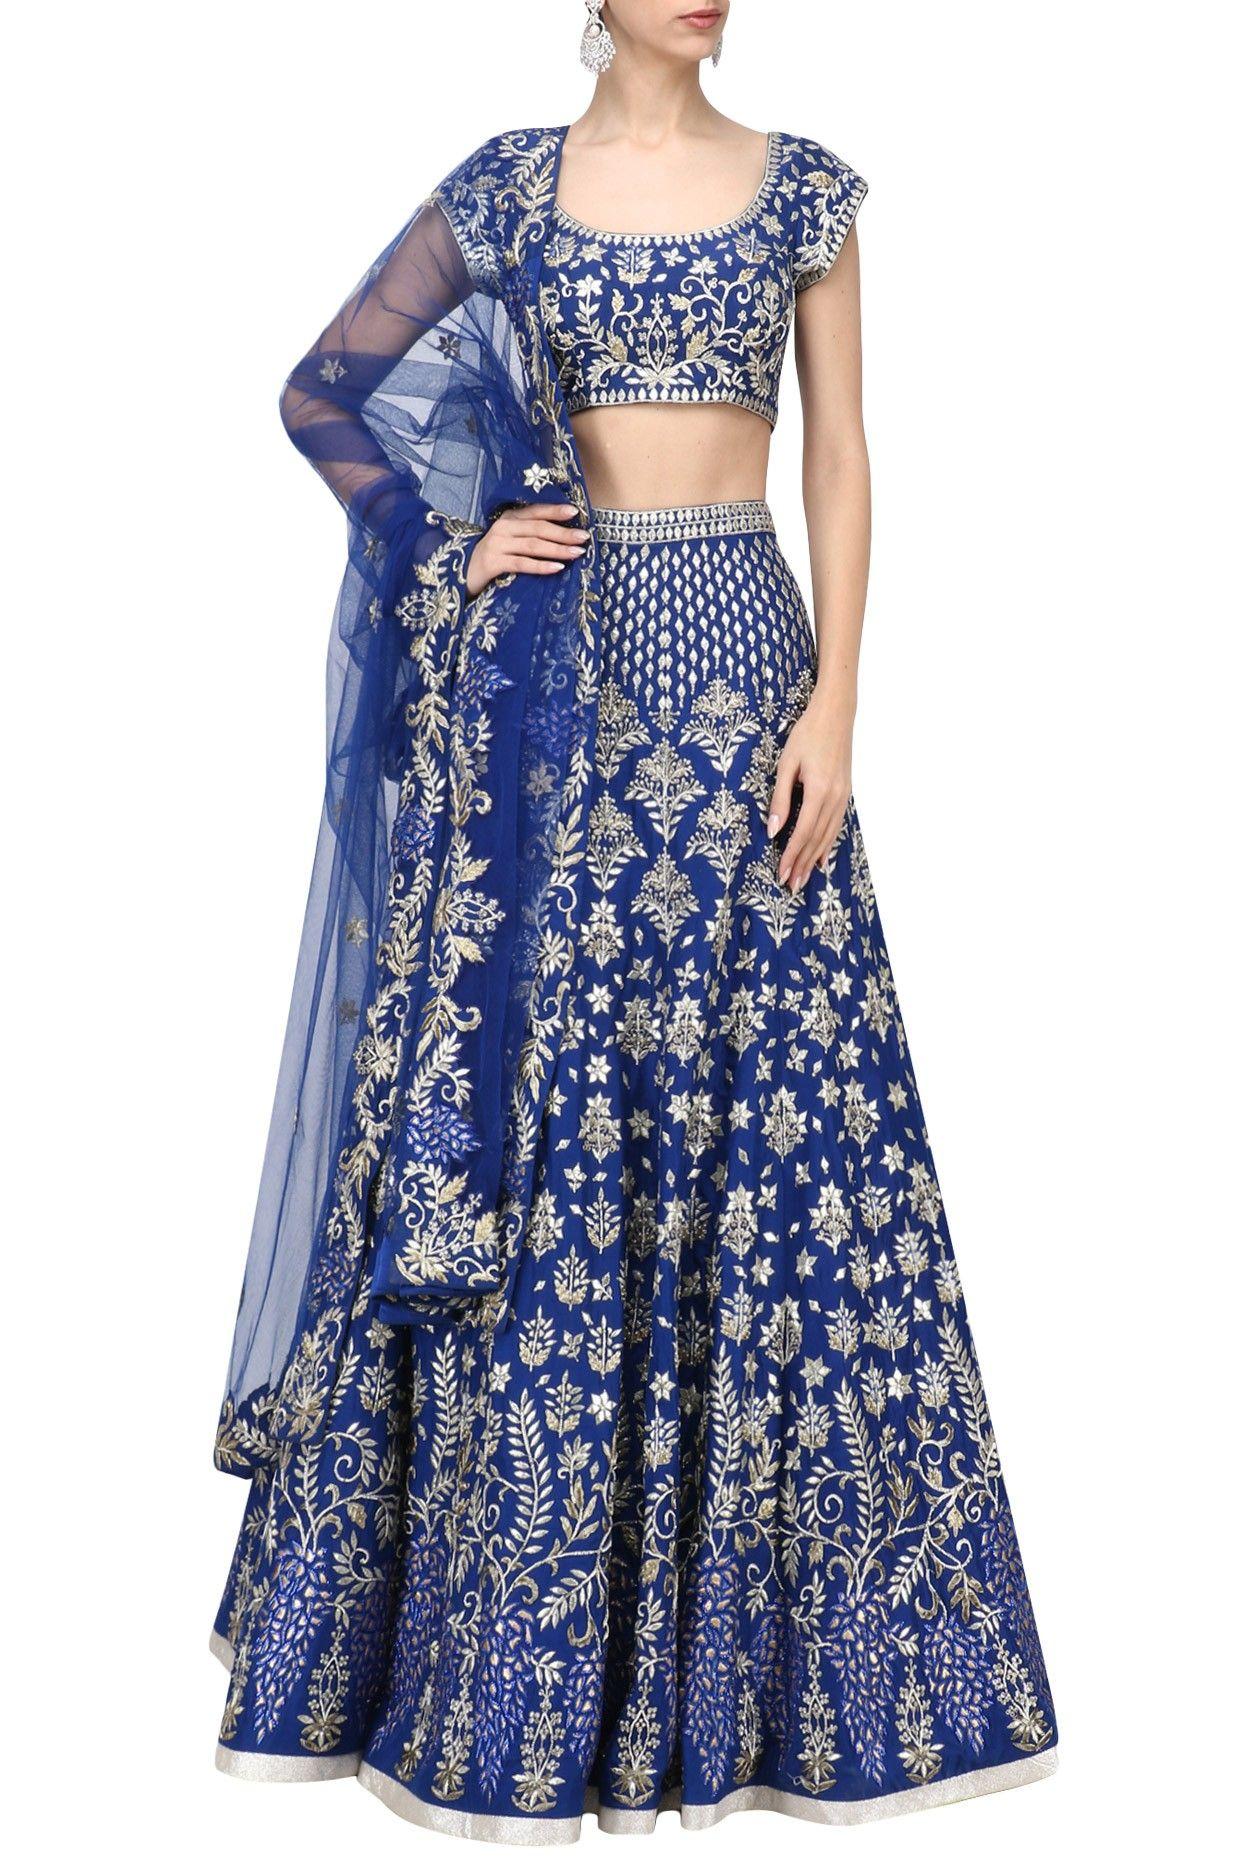 Ibfw royal blue embroidered lehenga set shop now ibfw